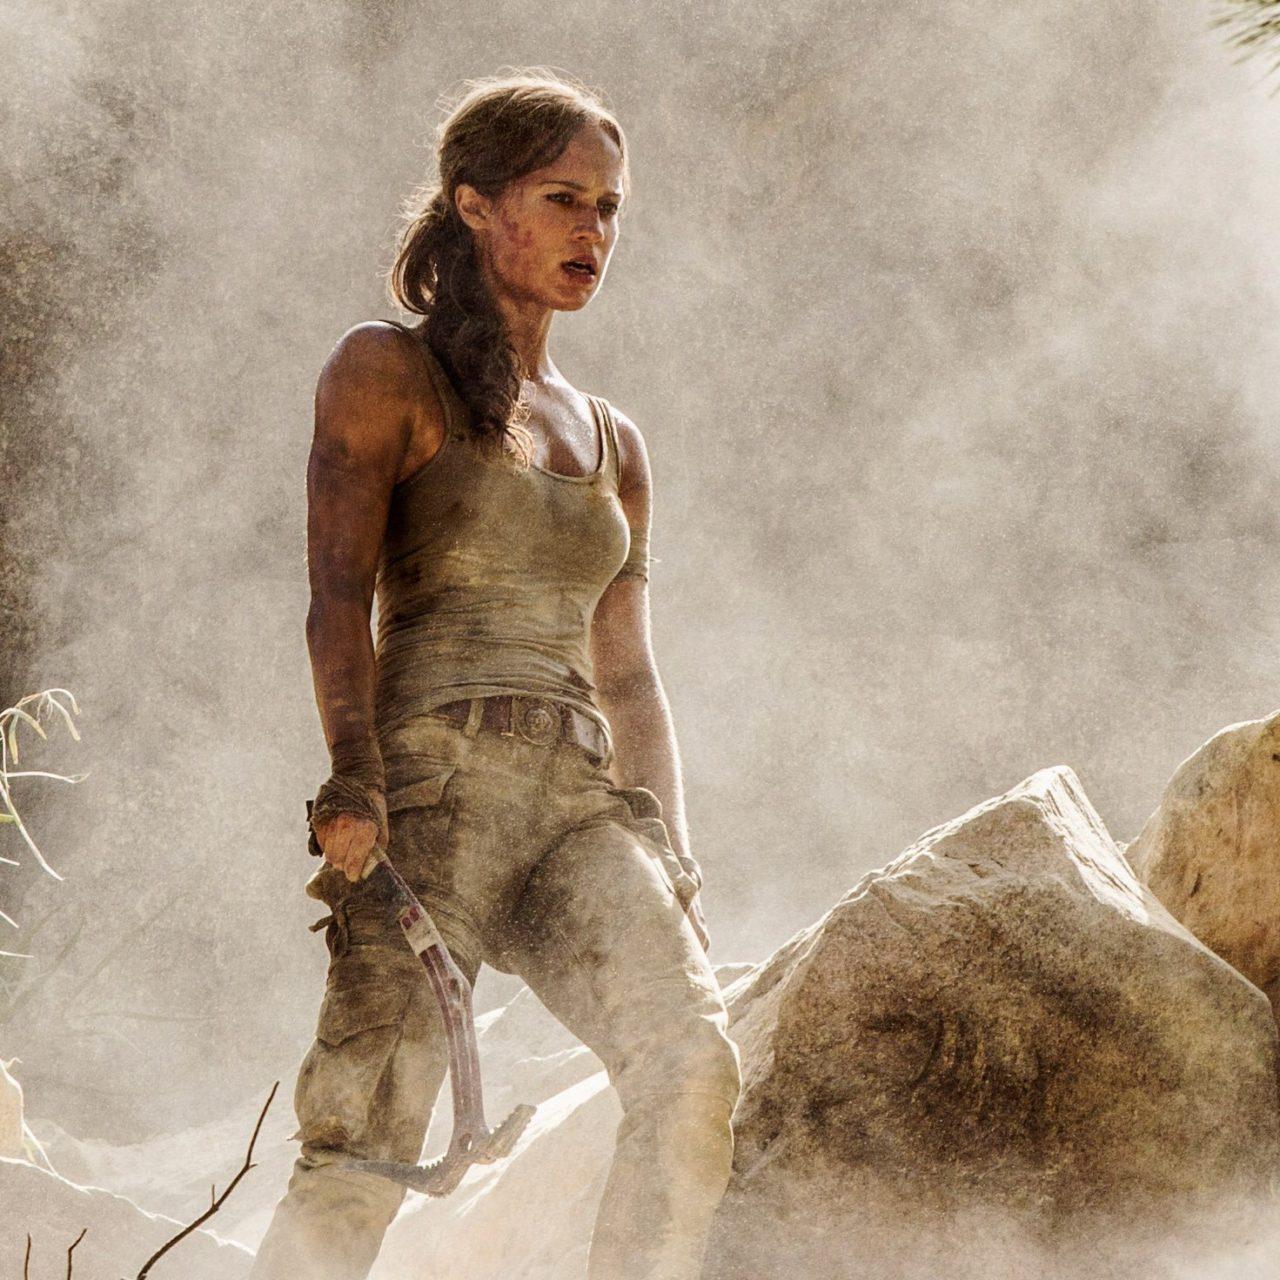 Tomb Raider Wallpaper 1920x1080: Tomb Raider Movie 2018 Wallpapers